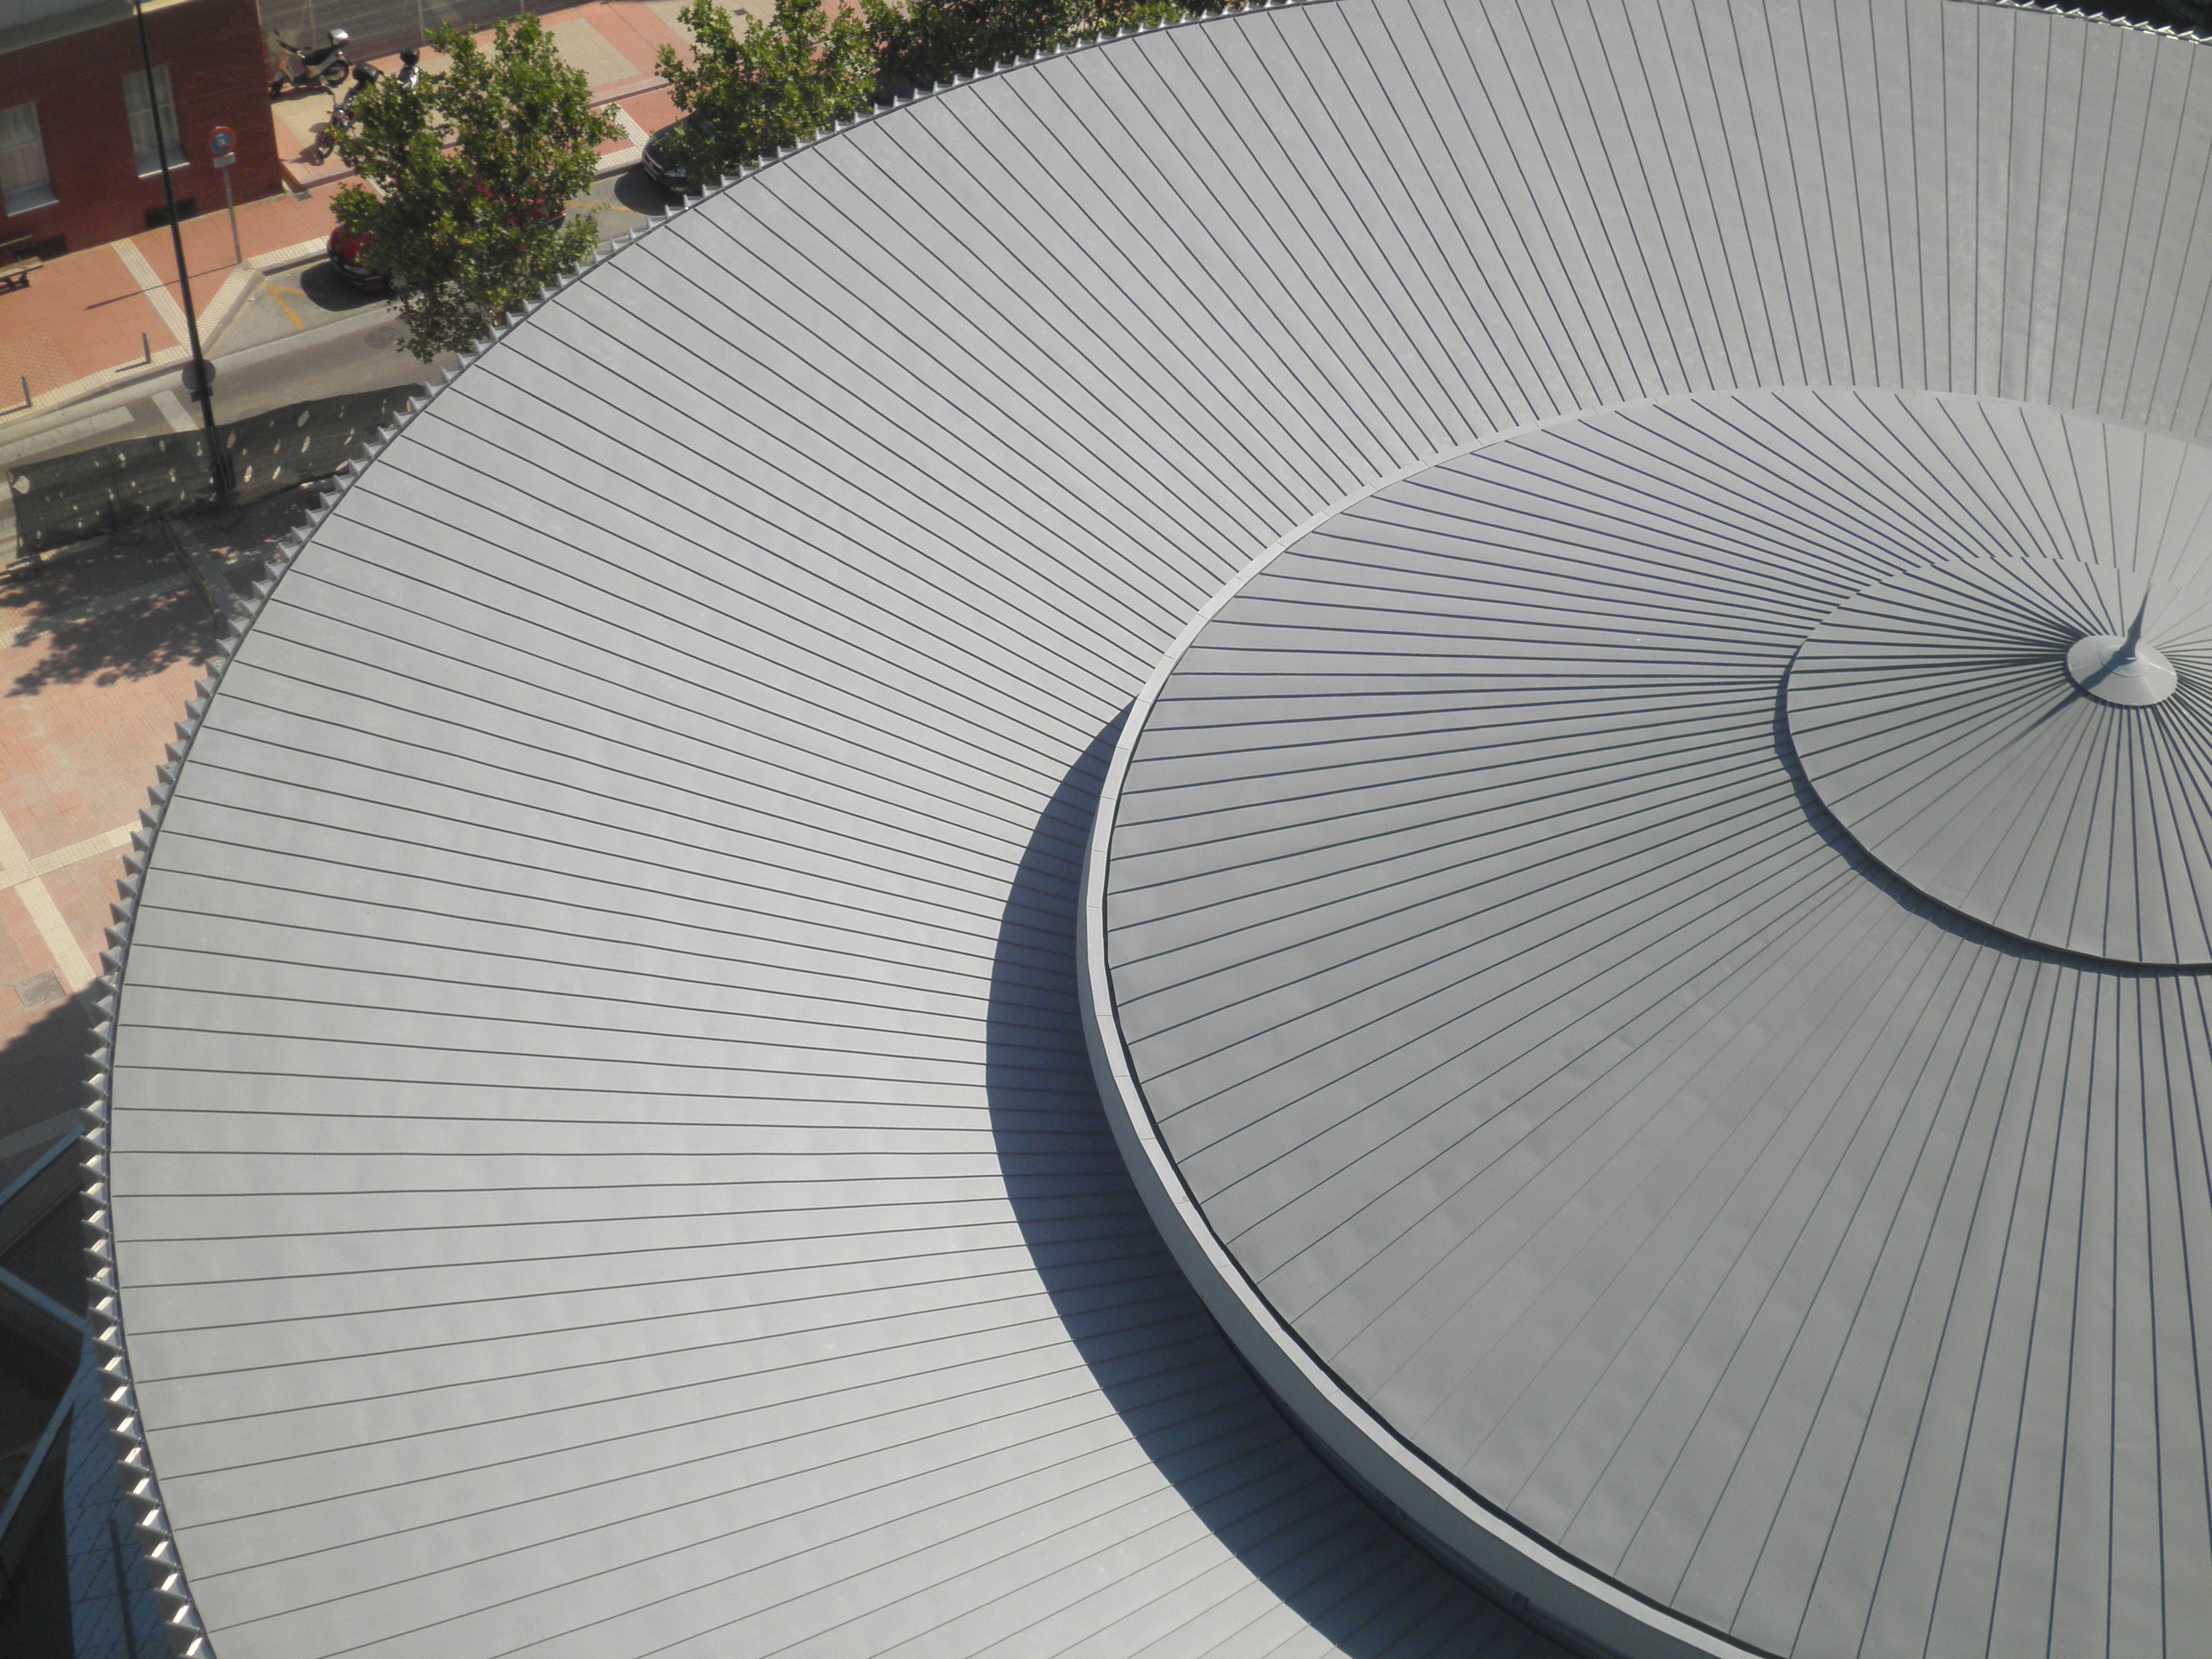 tejado-zinc-junta-alzada-conica